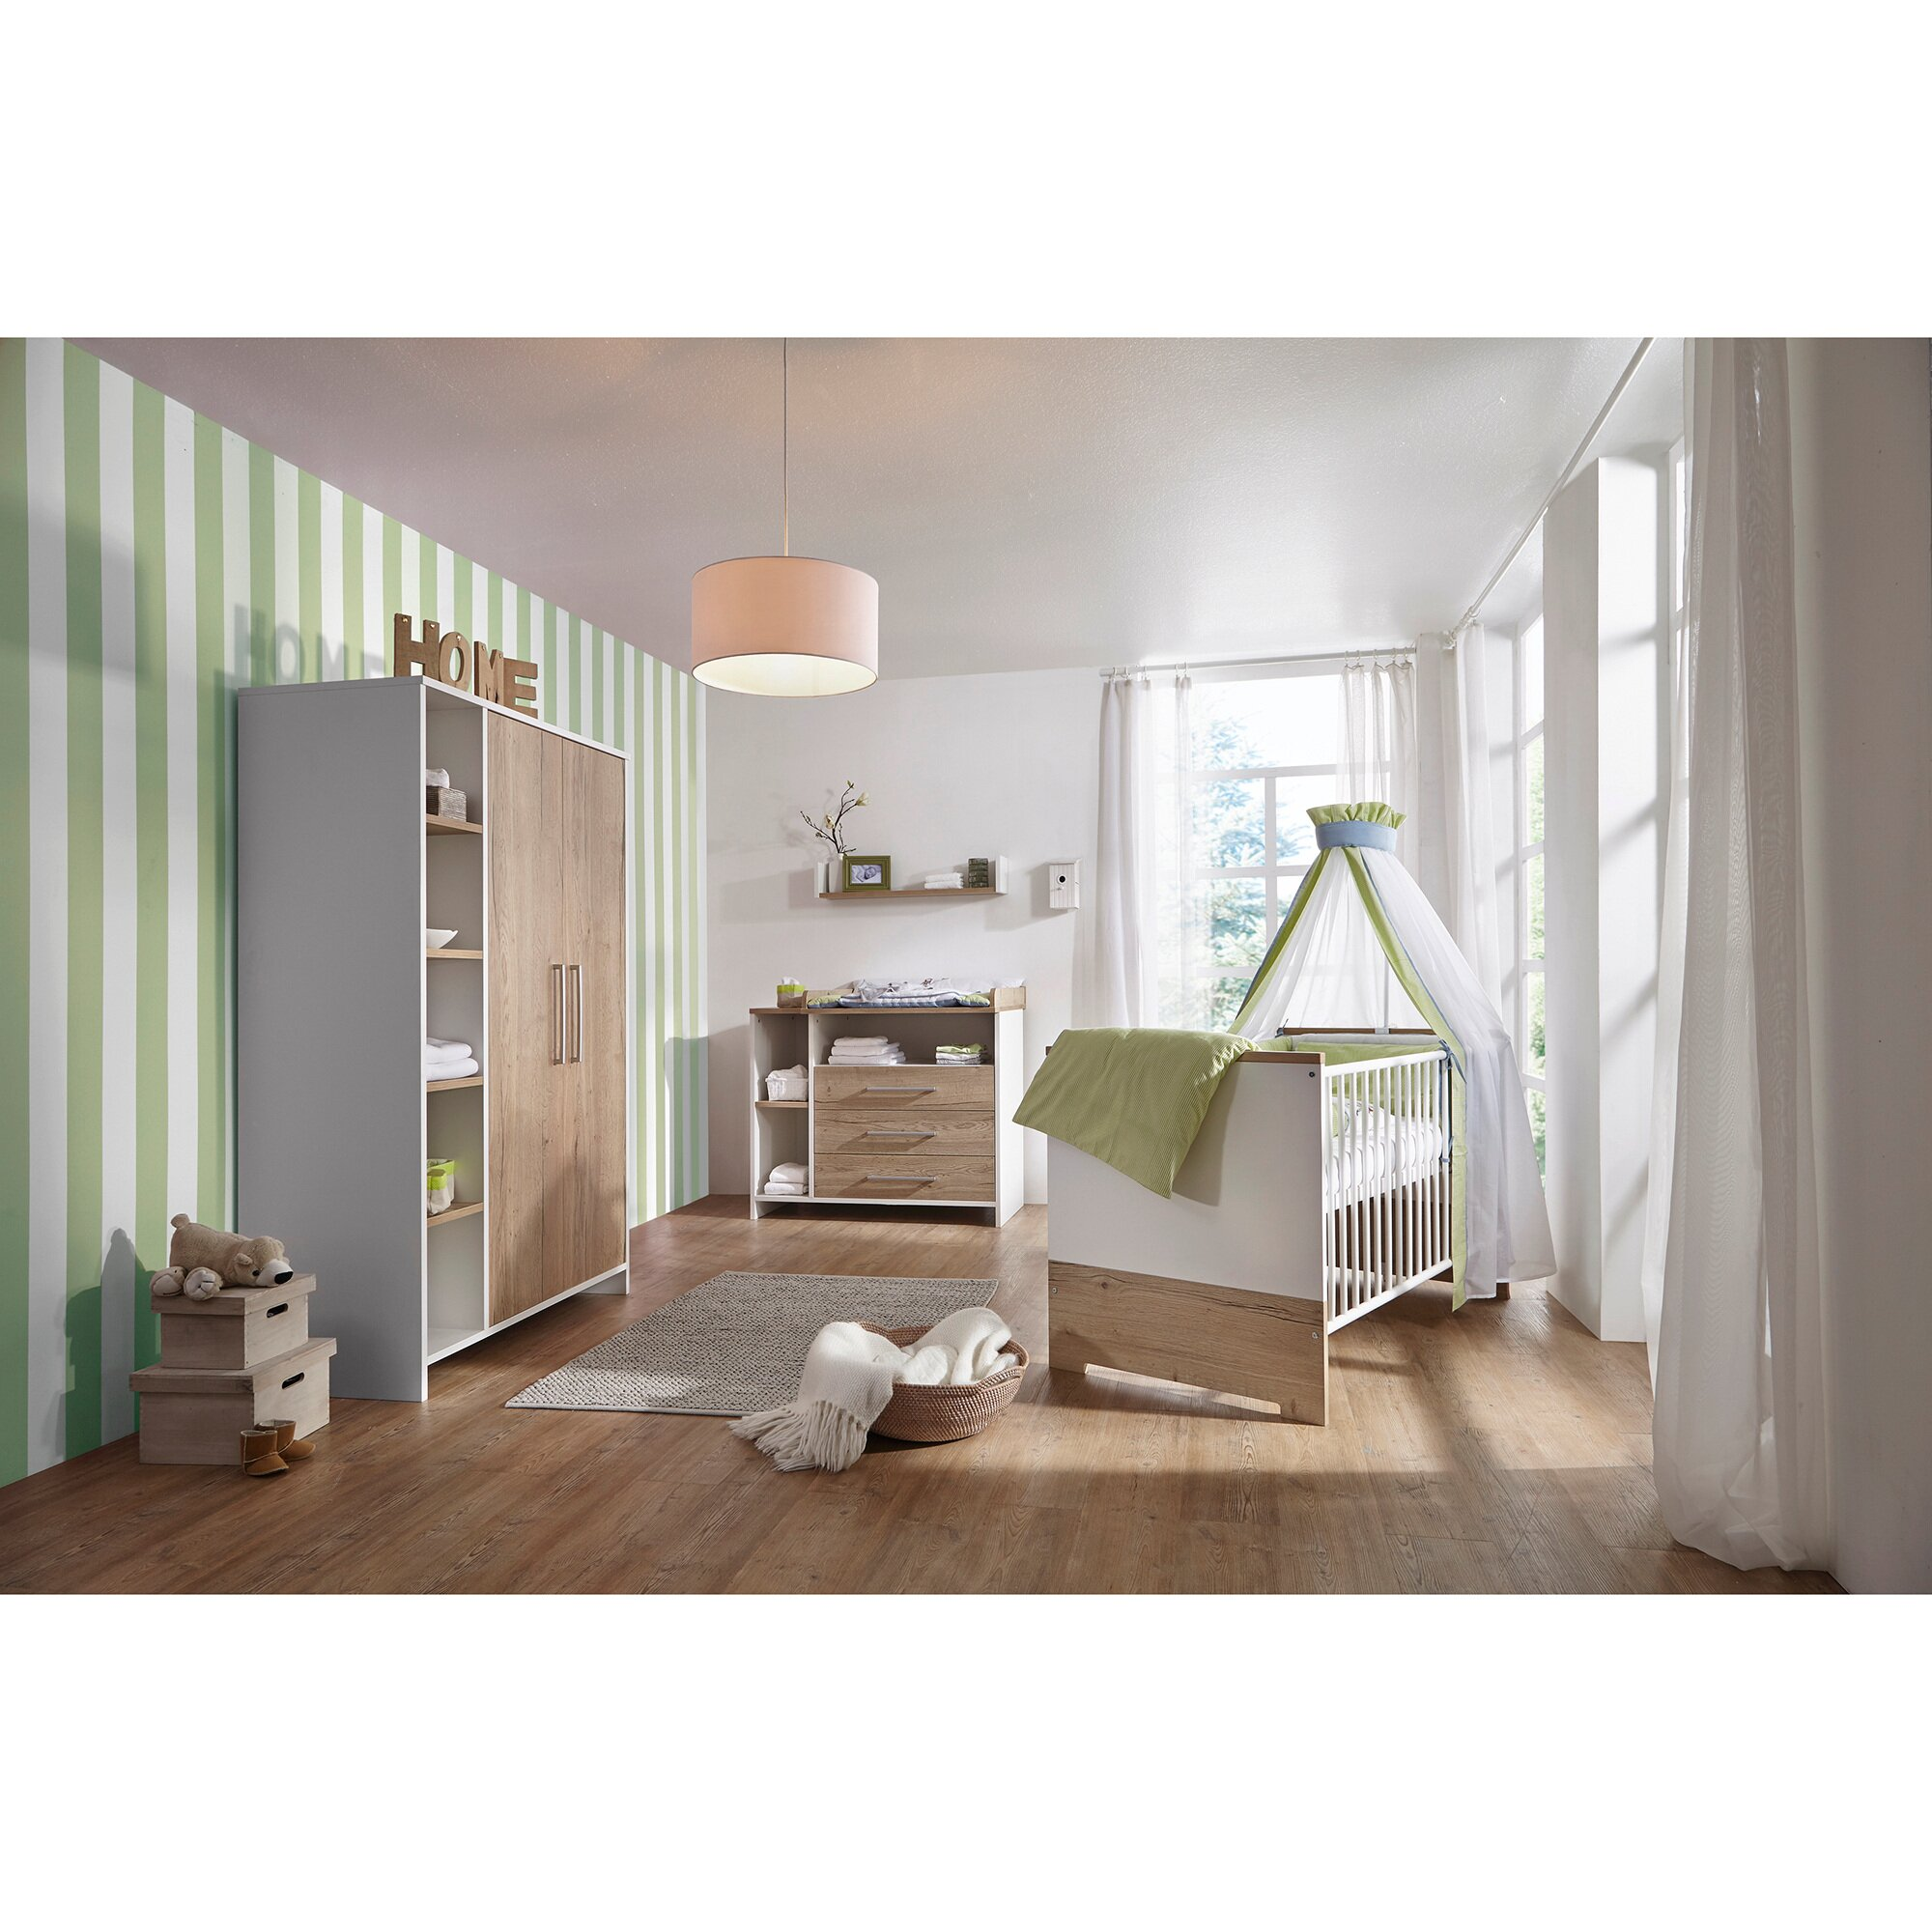 "Schardt Kinderzimmer ""Eco Plus"" inkl. 2trg. Kleiderschrank"